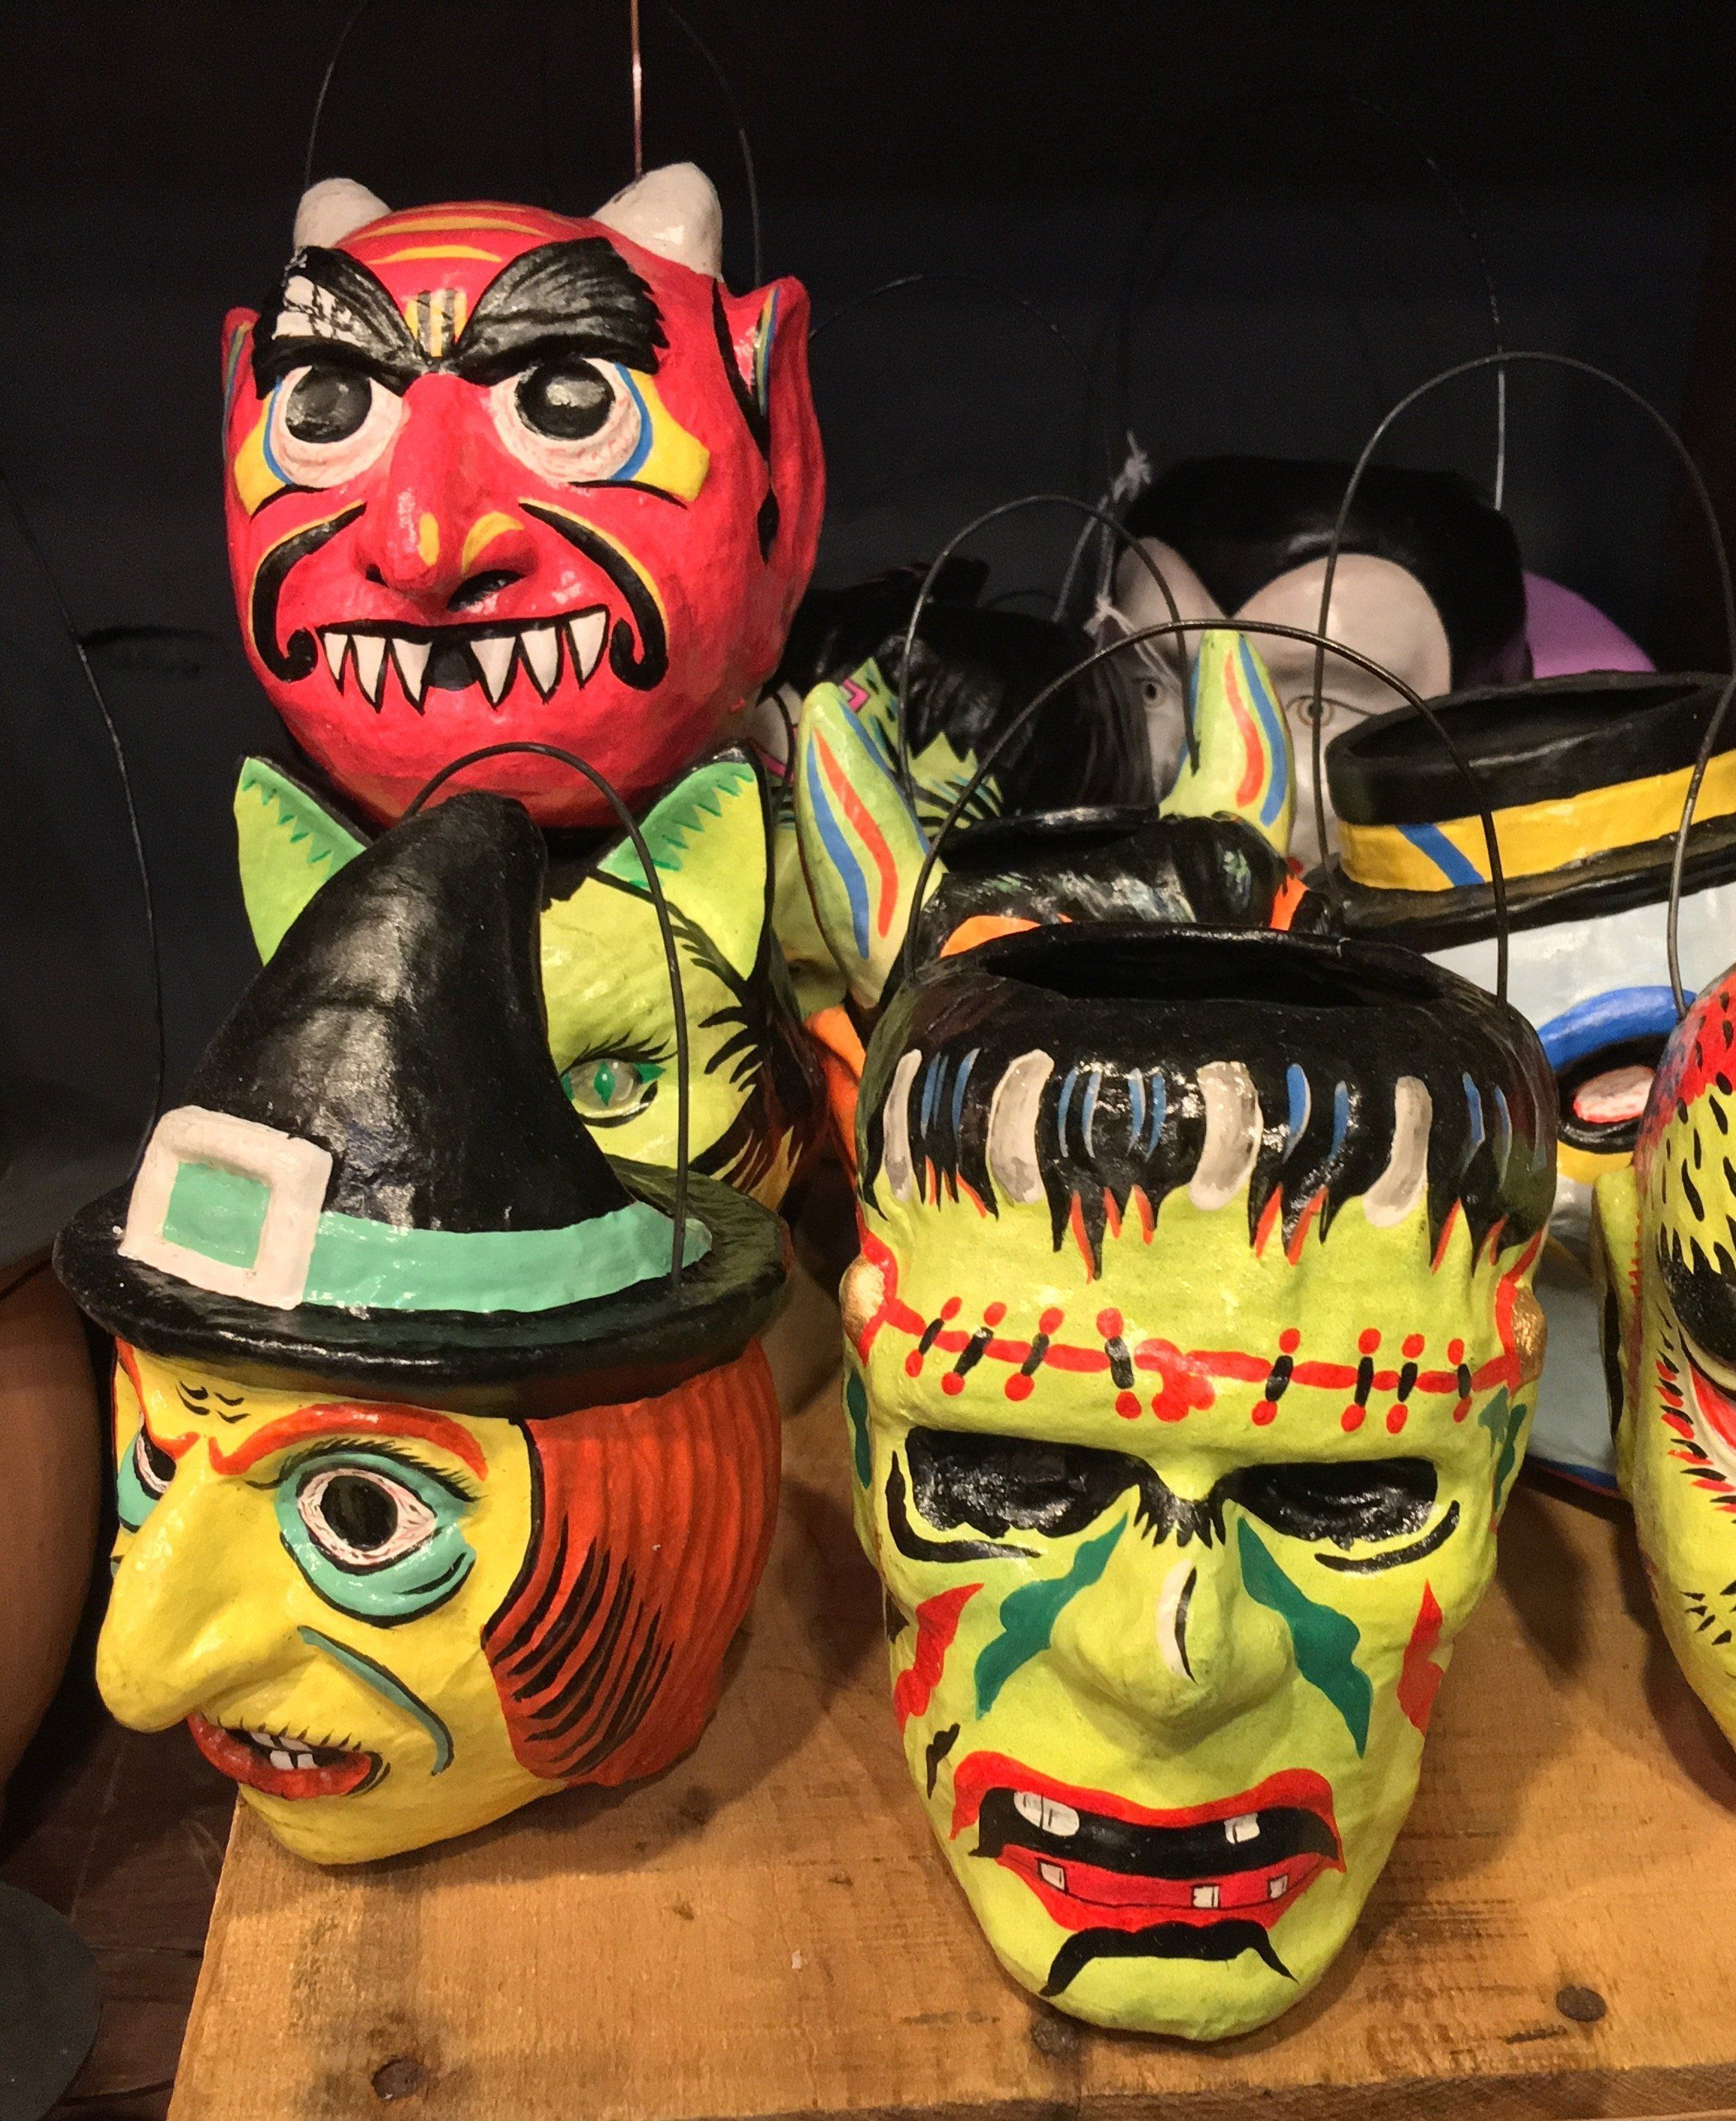 6 Neon Mask Character Buckets Paper Mache